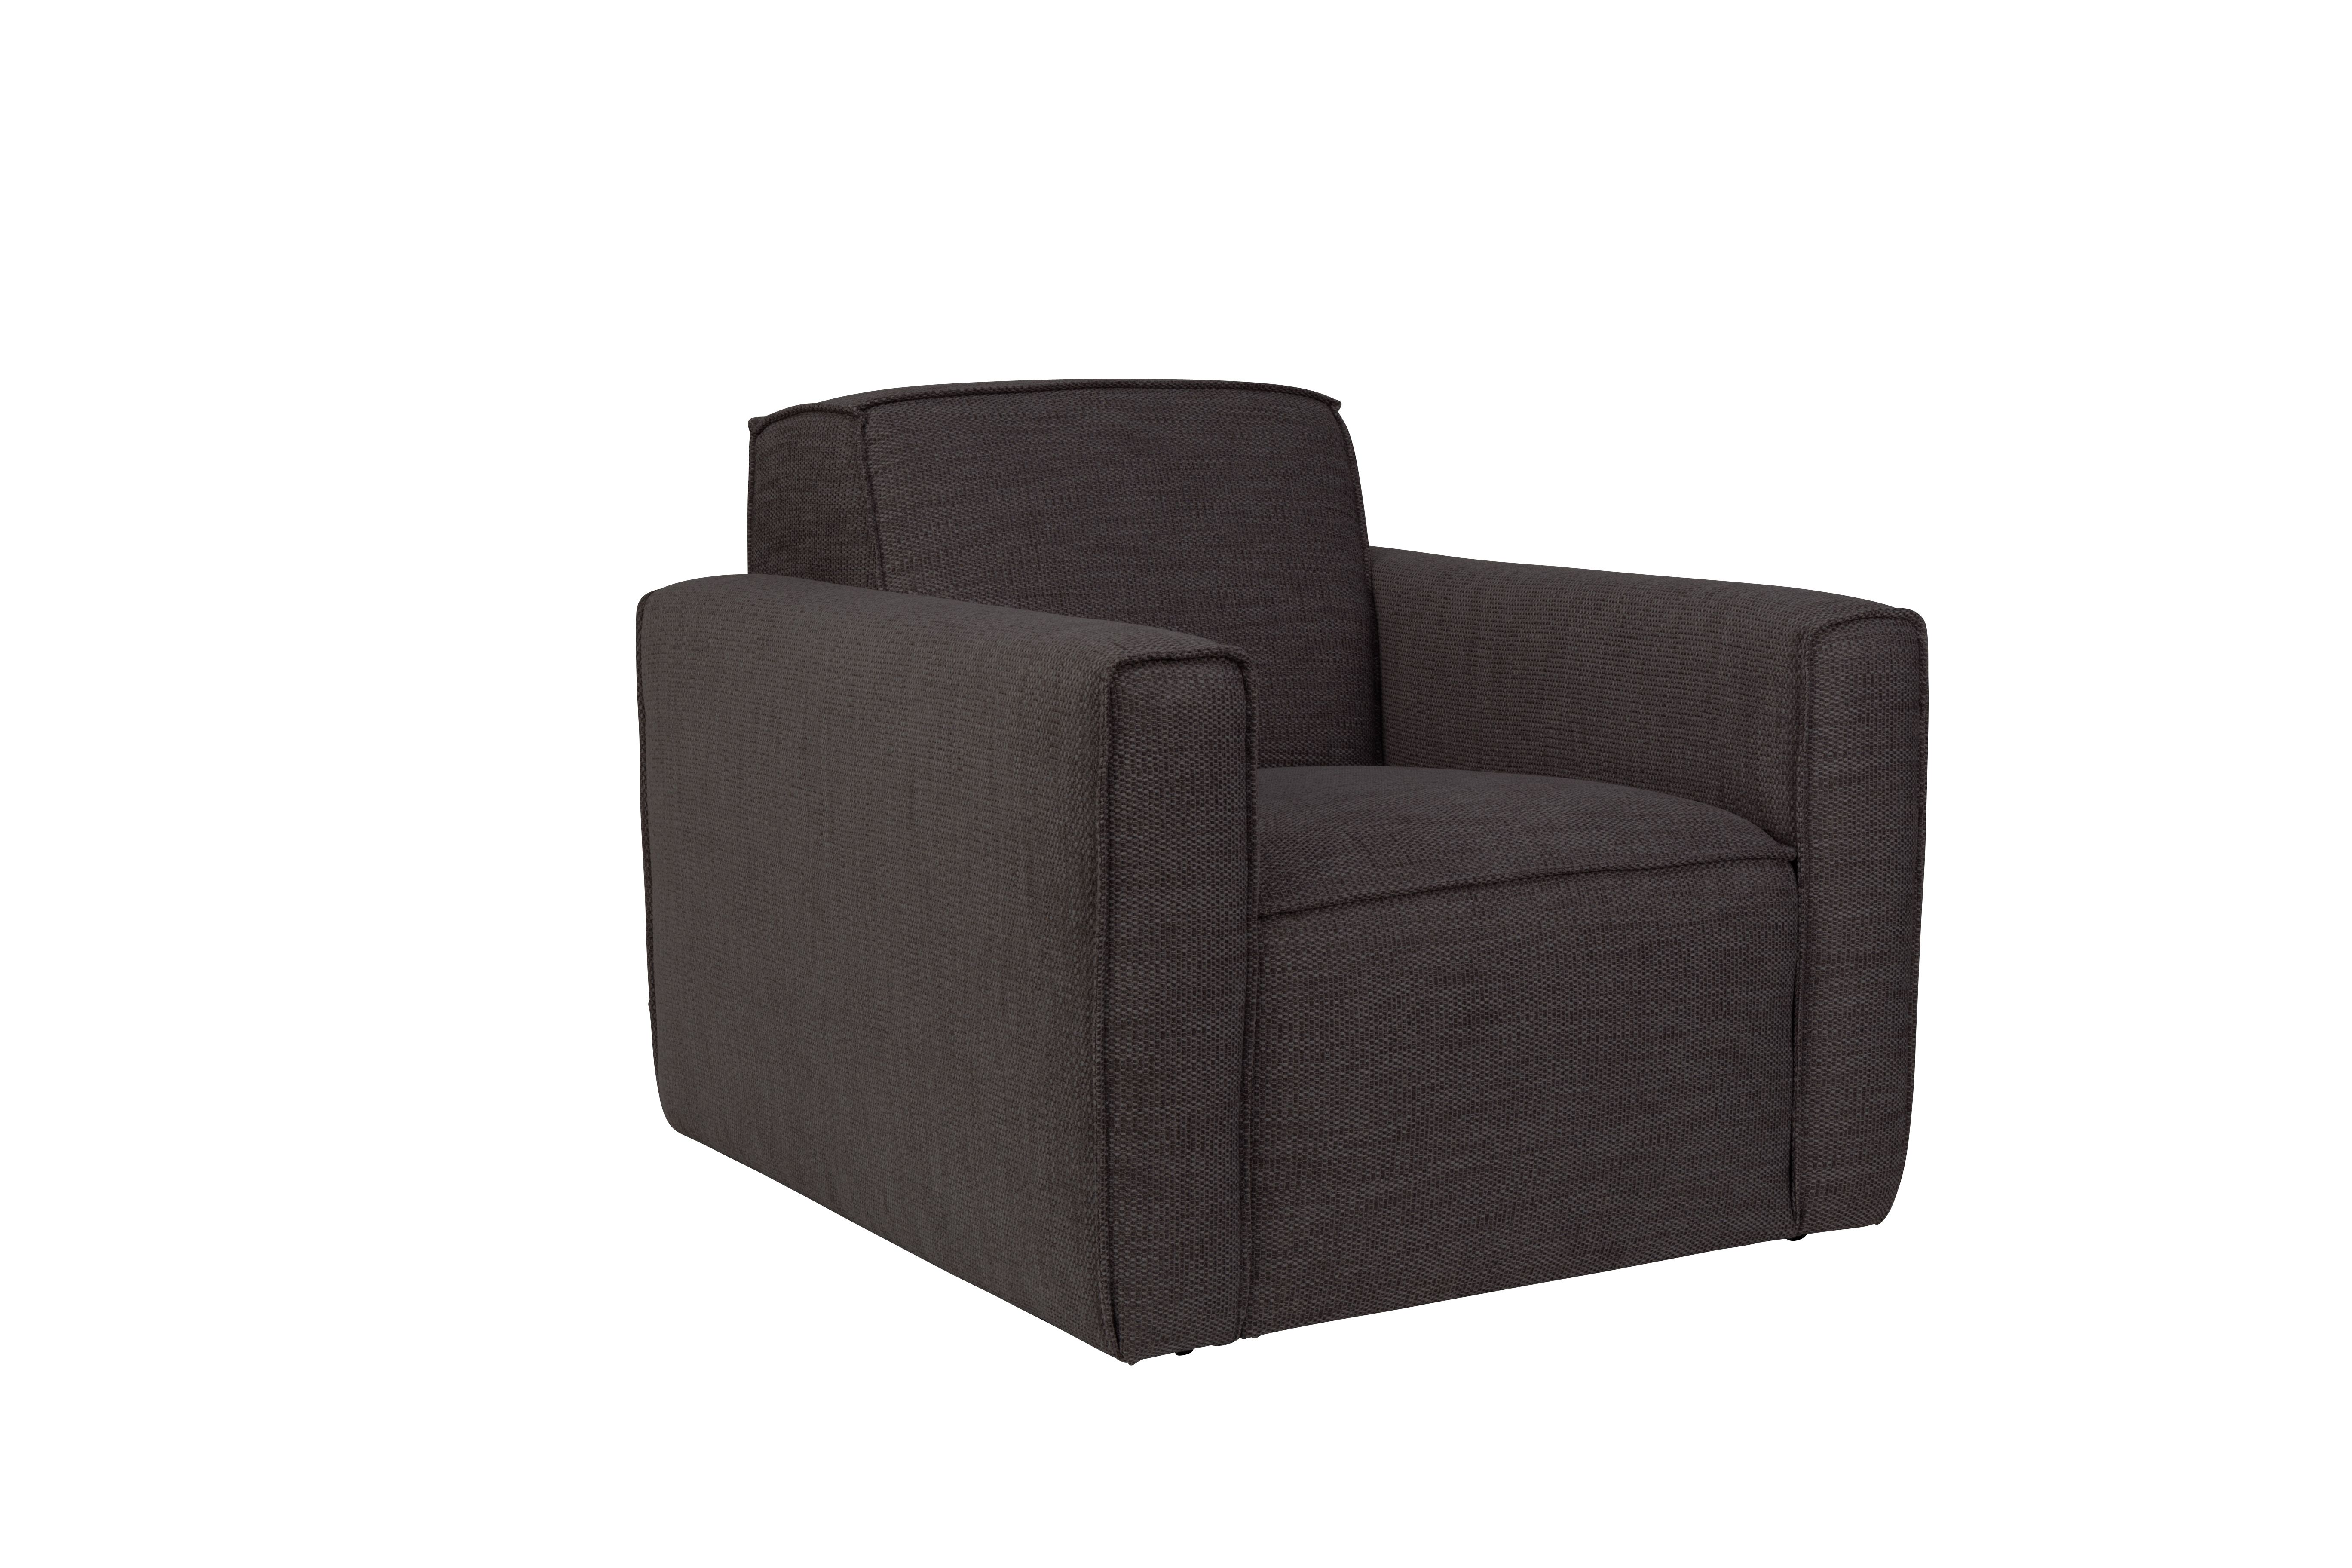 Bor Sofa 1 Seater Zuiver Comfy Armchair Comfortable Armchair Seater